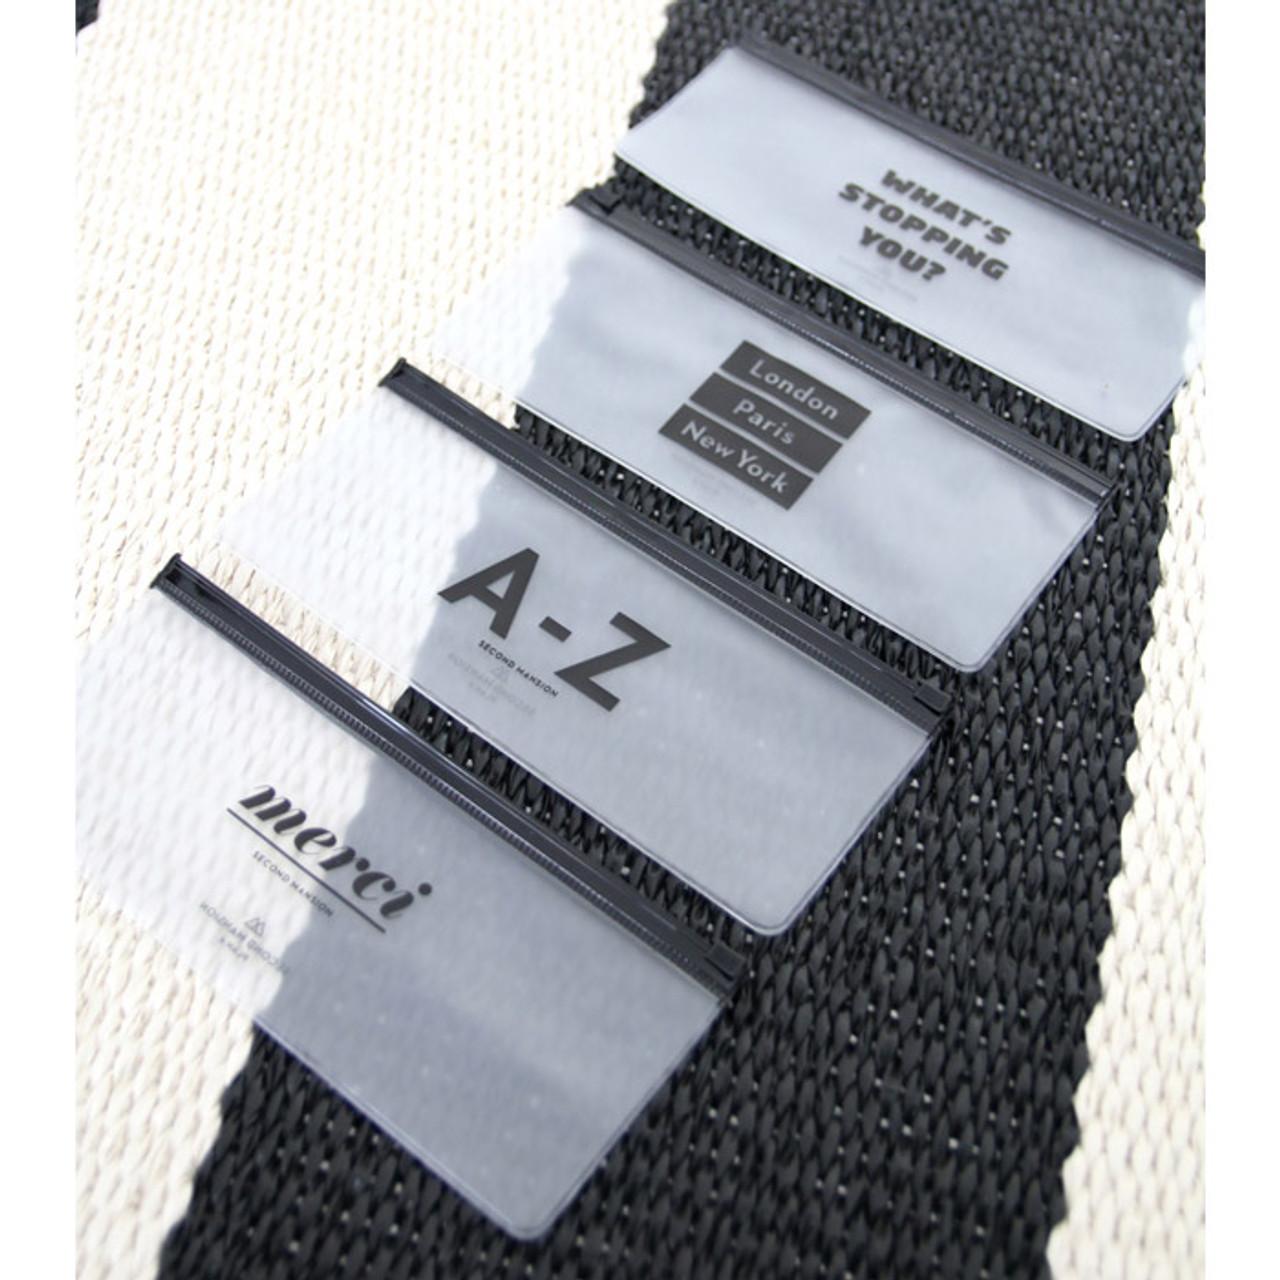 PlanD Black typo clear zip lock pouch slim - fallindesign.com